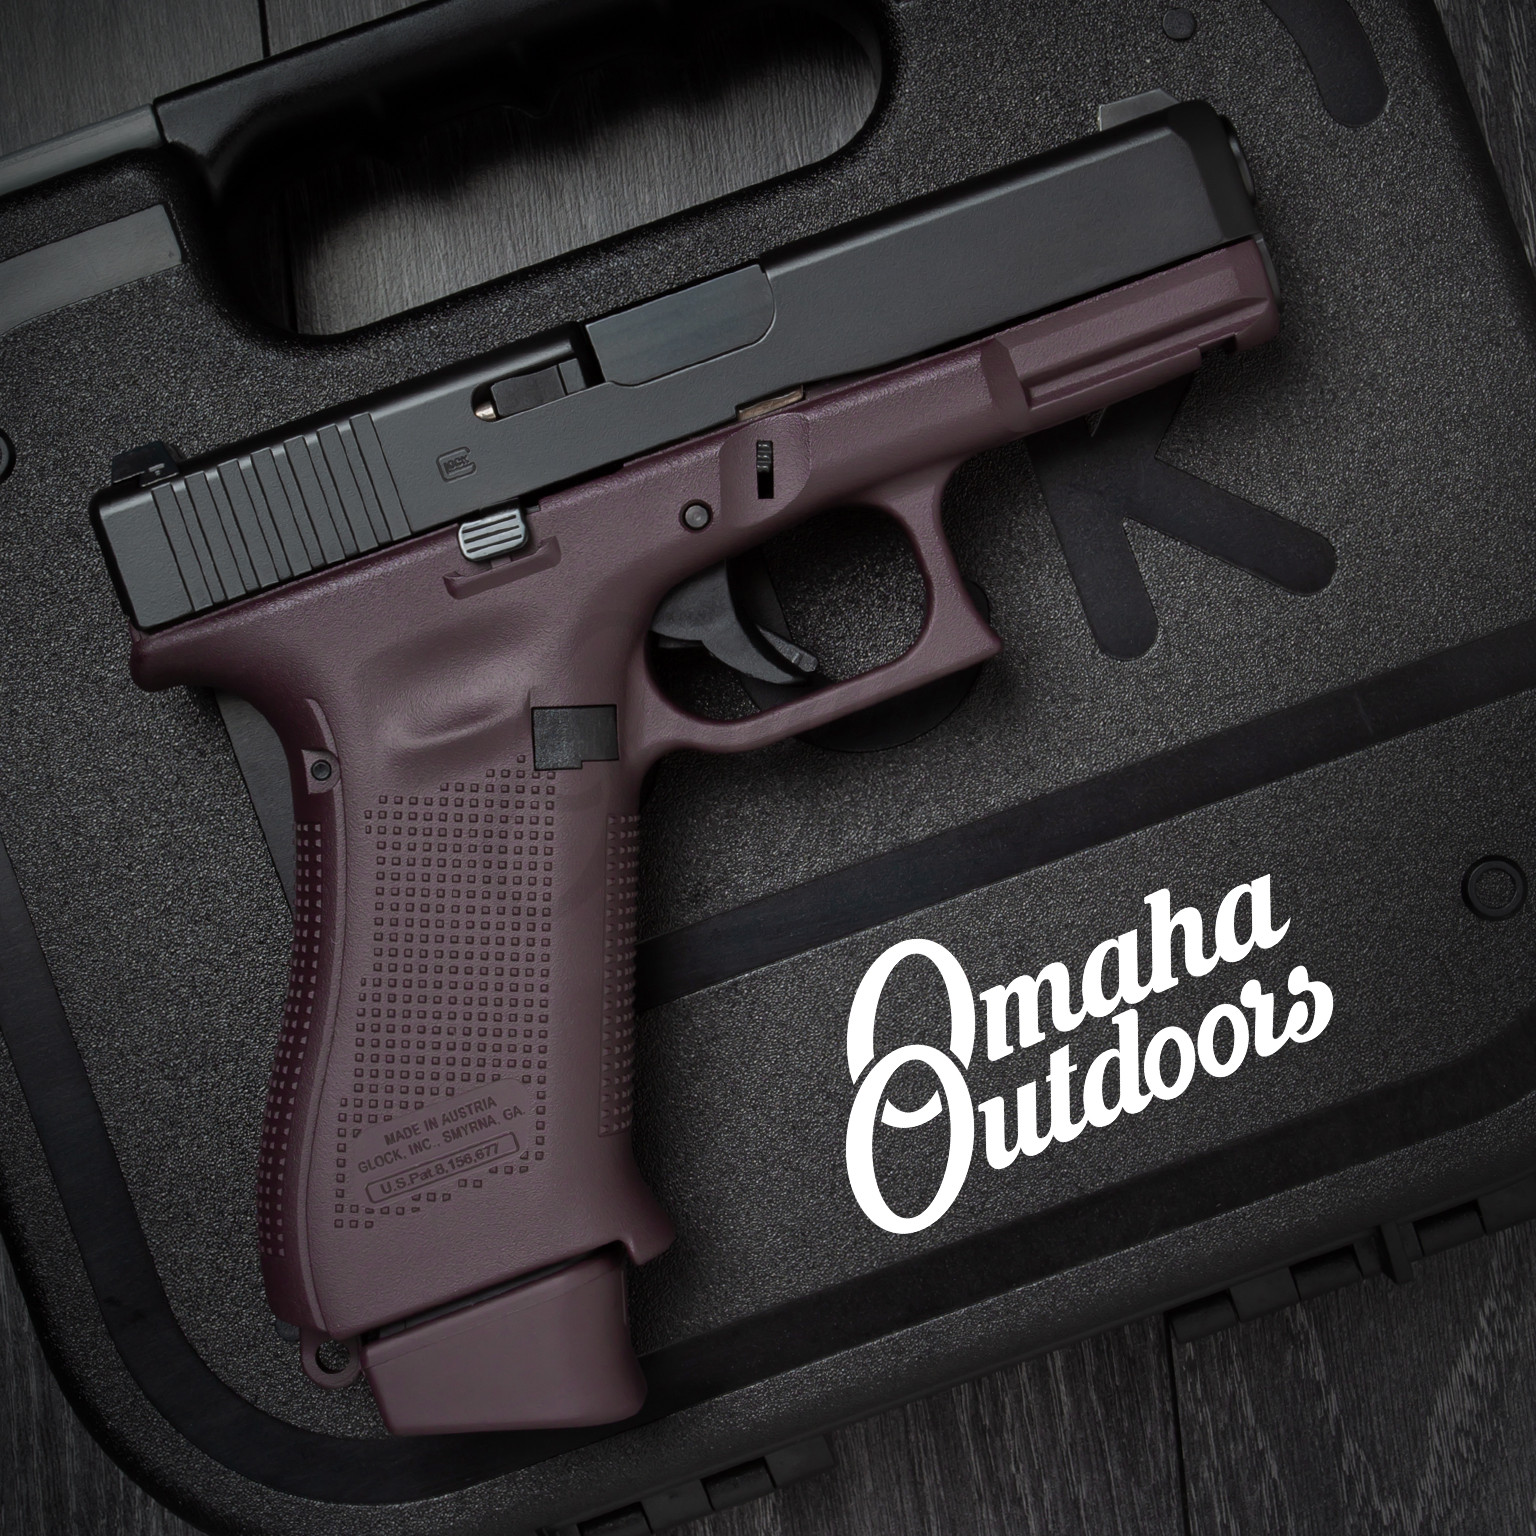 Glock 19X Gen 5 Plum Pistol Black Slide 9mm 17, 19 RD Night Sights  PX1950703-PLM-FR-FBK-SL